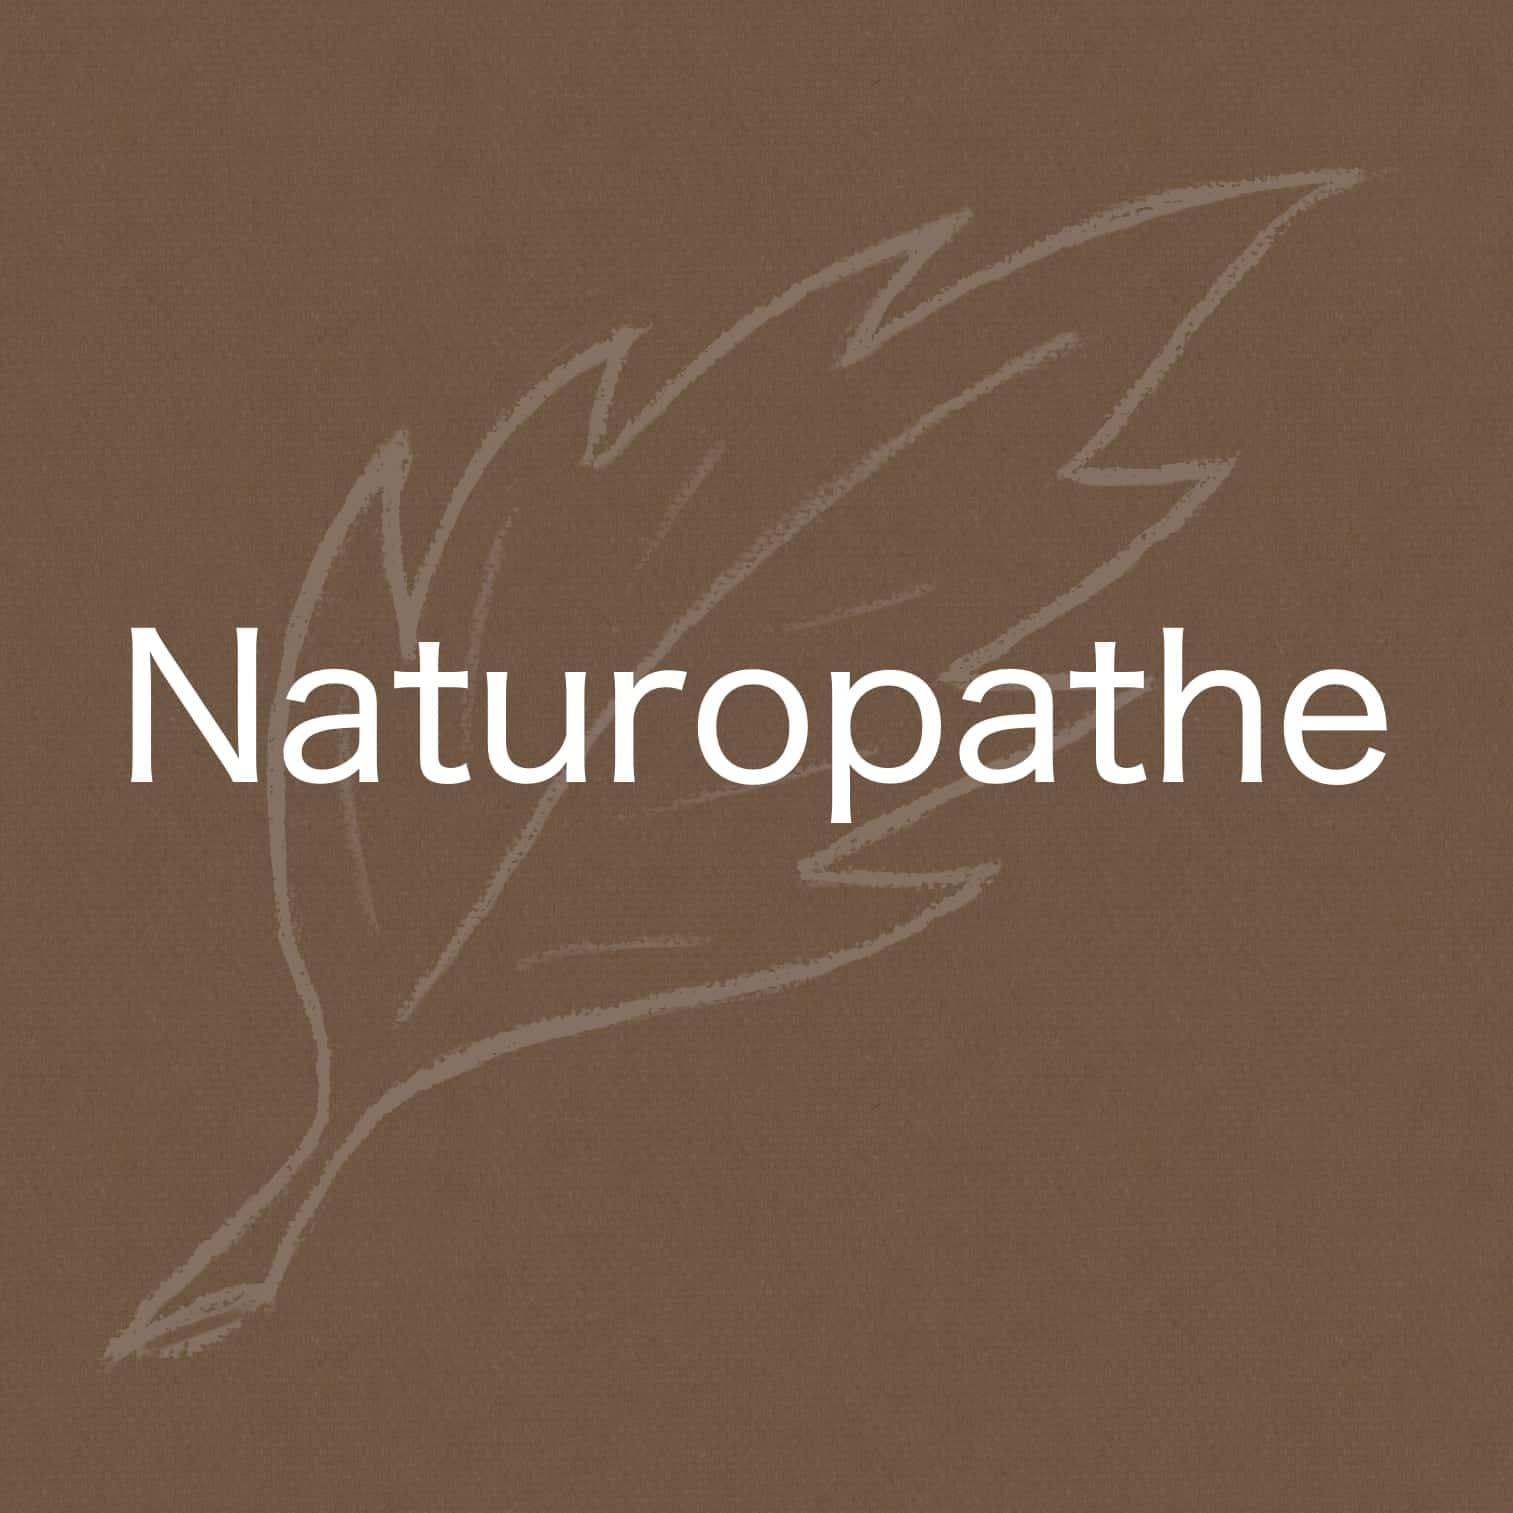 Naturopathe Hover logo site